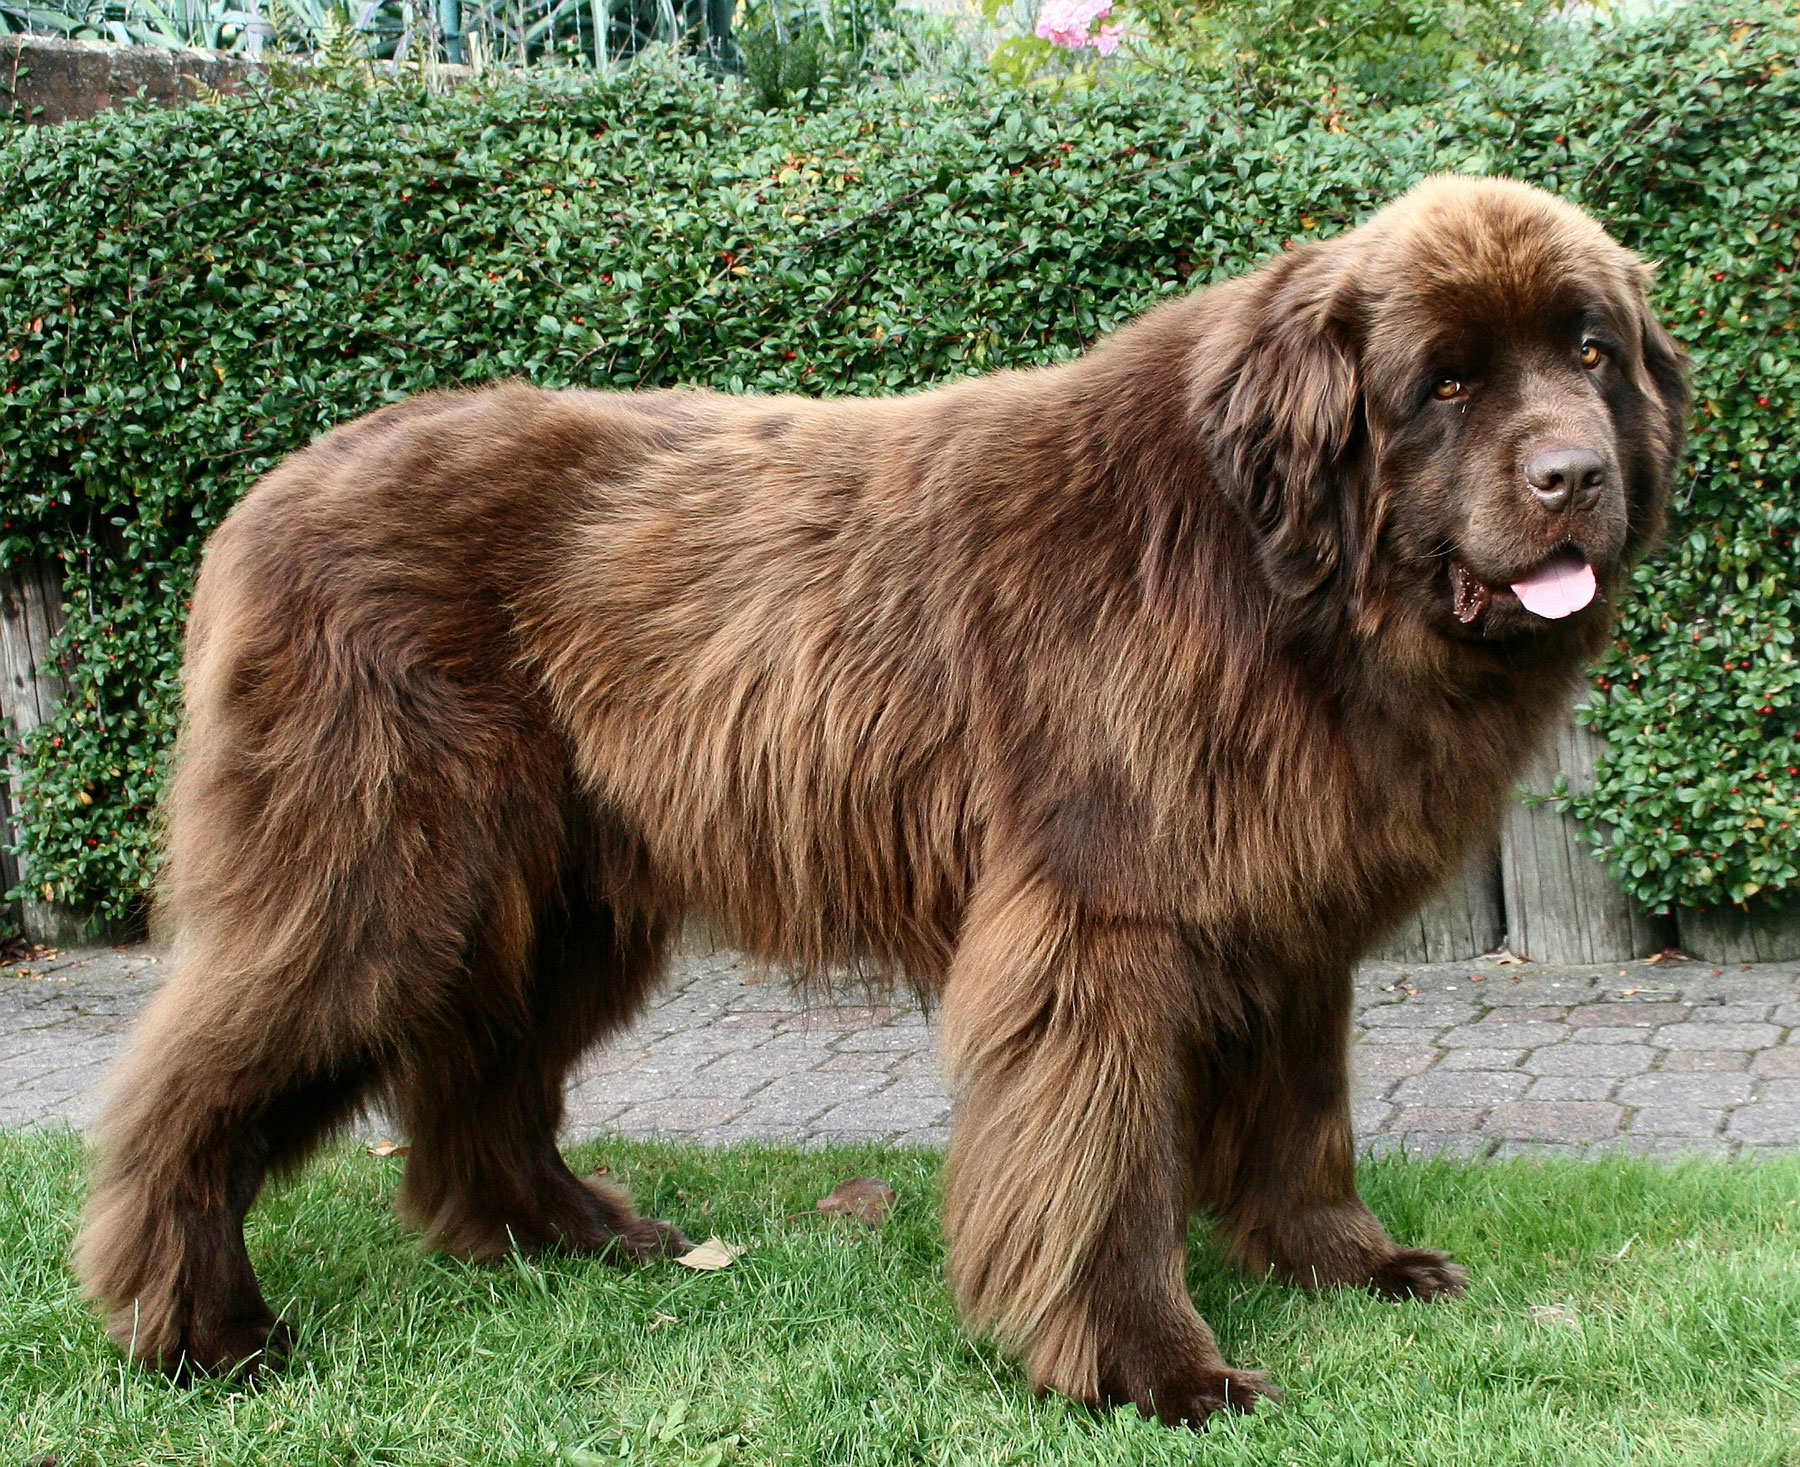 Big Brown Dog That Looks Like A Bear